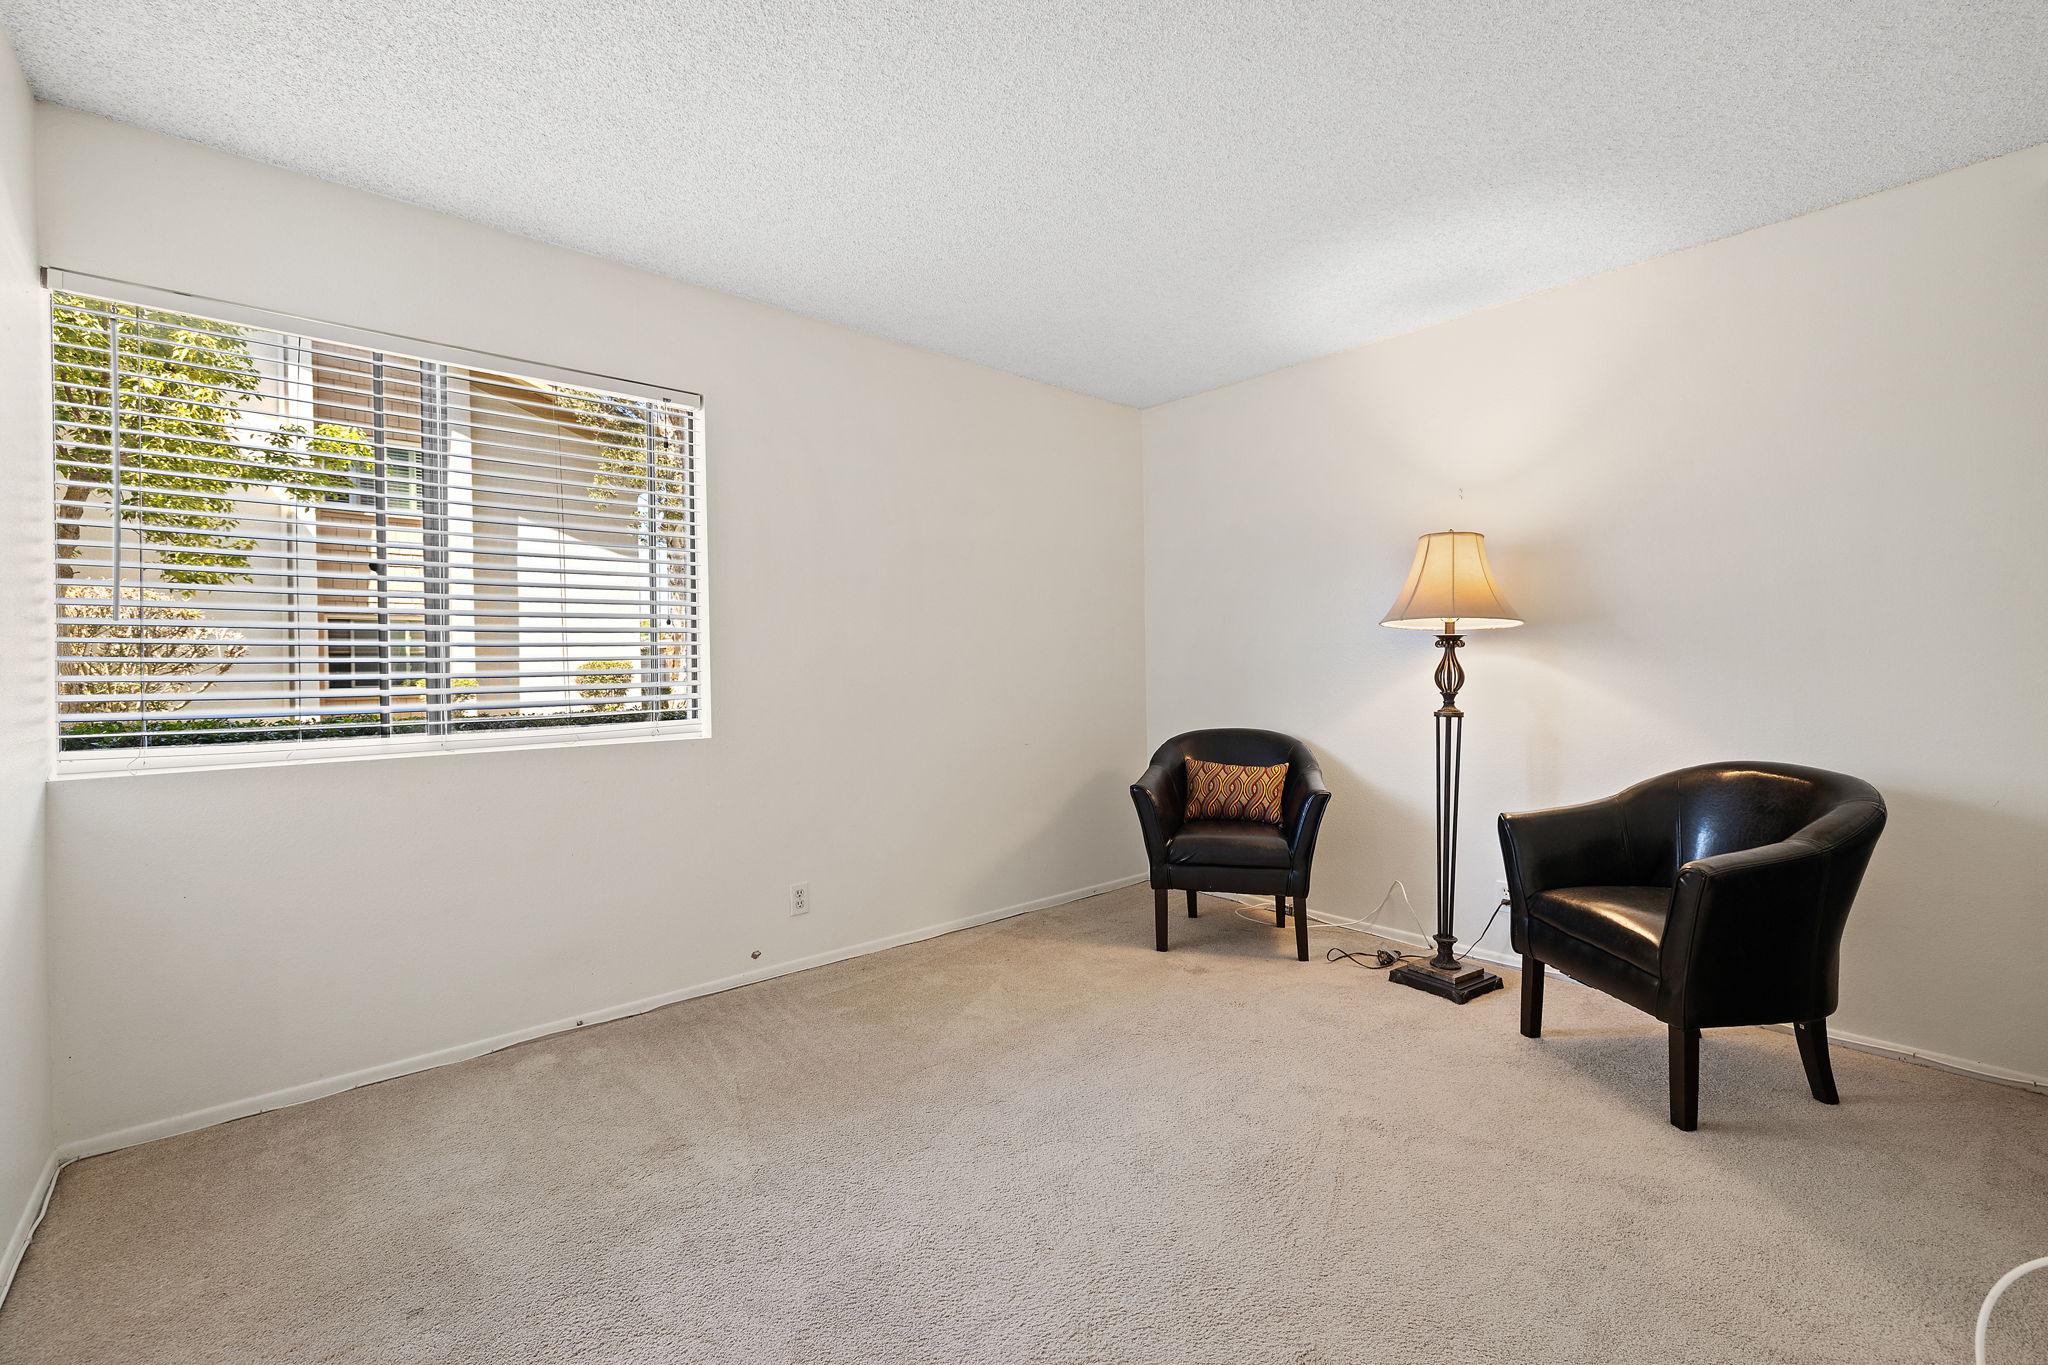 8933 Biscayne Ct, Huntington Beach, CA 92646, USA Photo 21